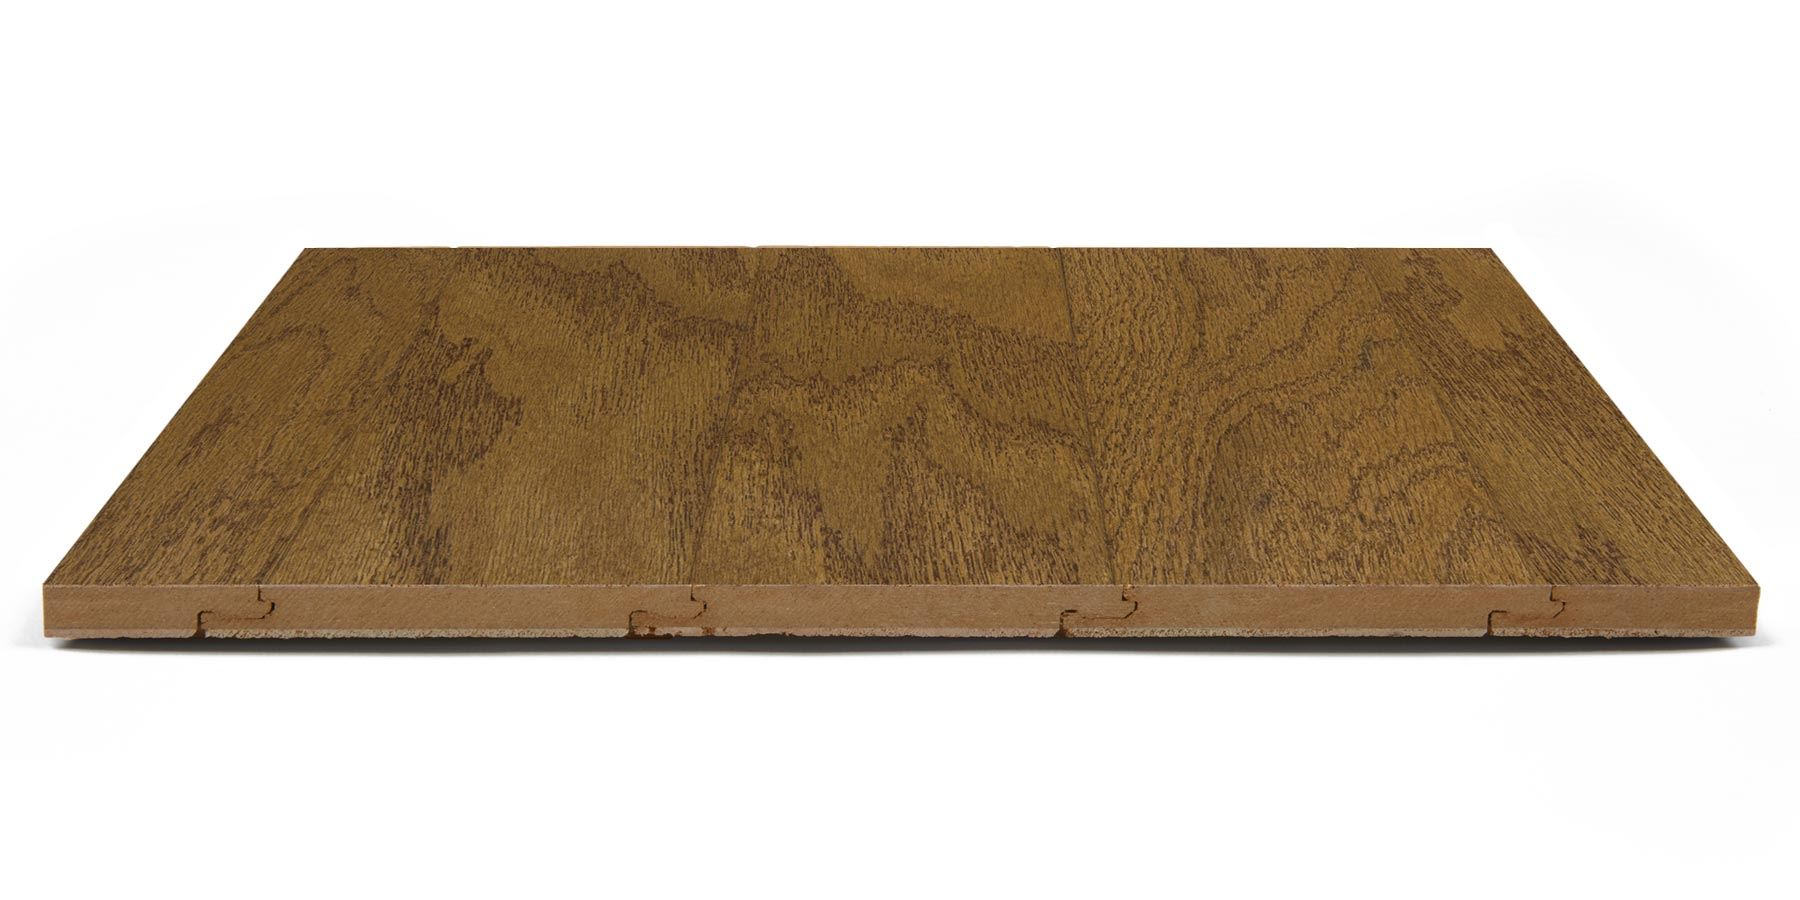 Accolade Honeytone Hardwood